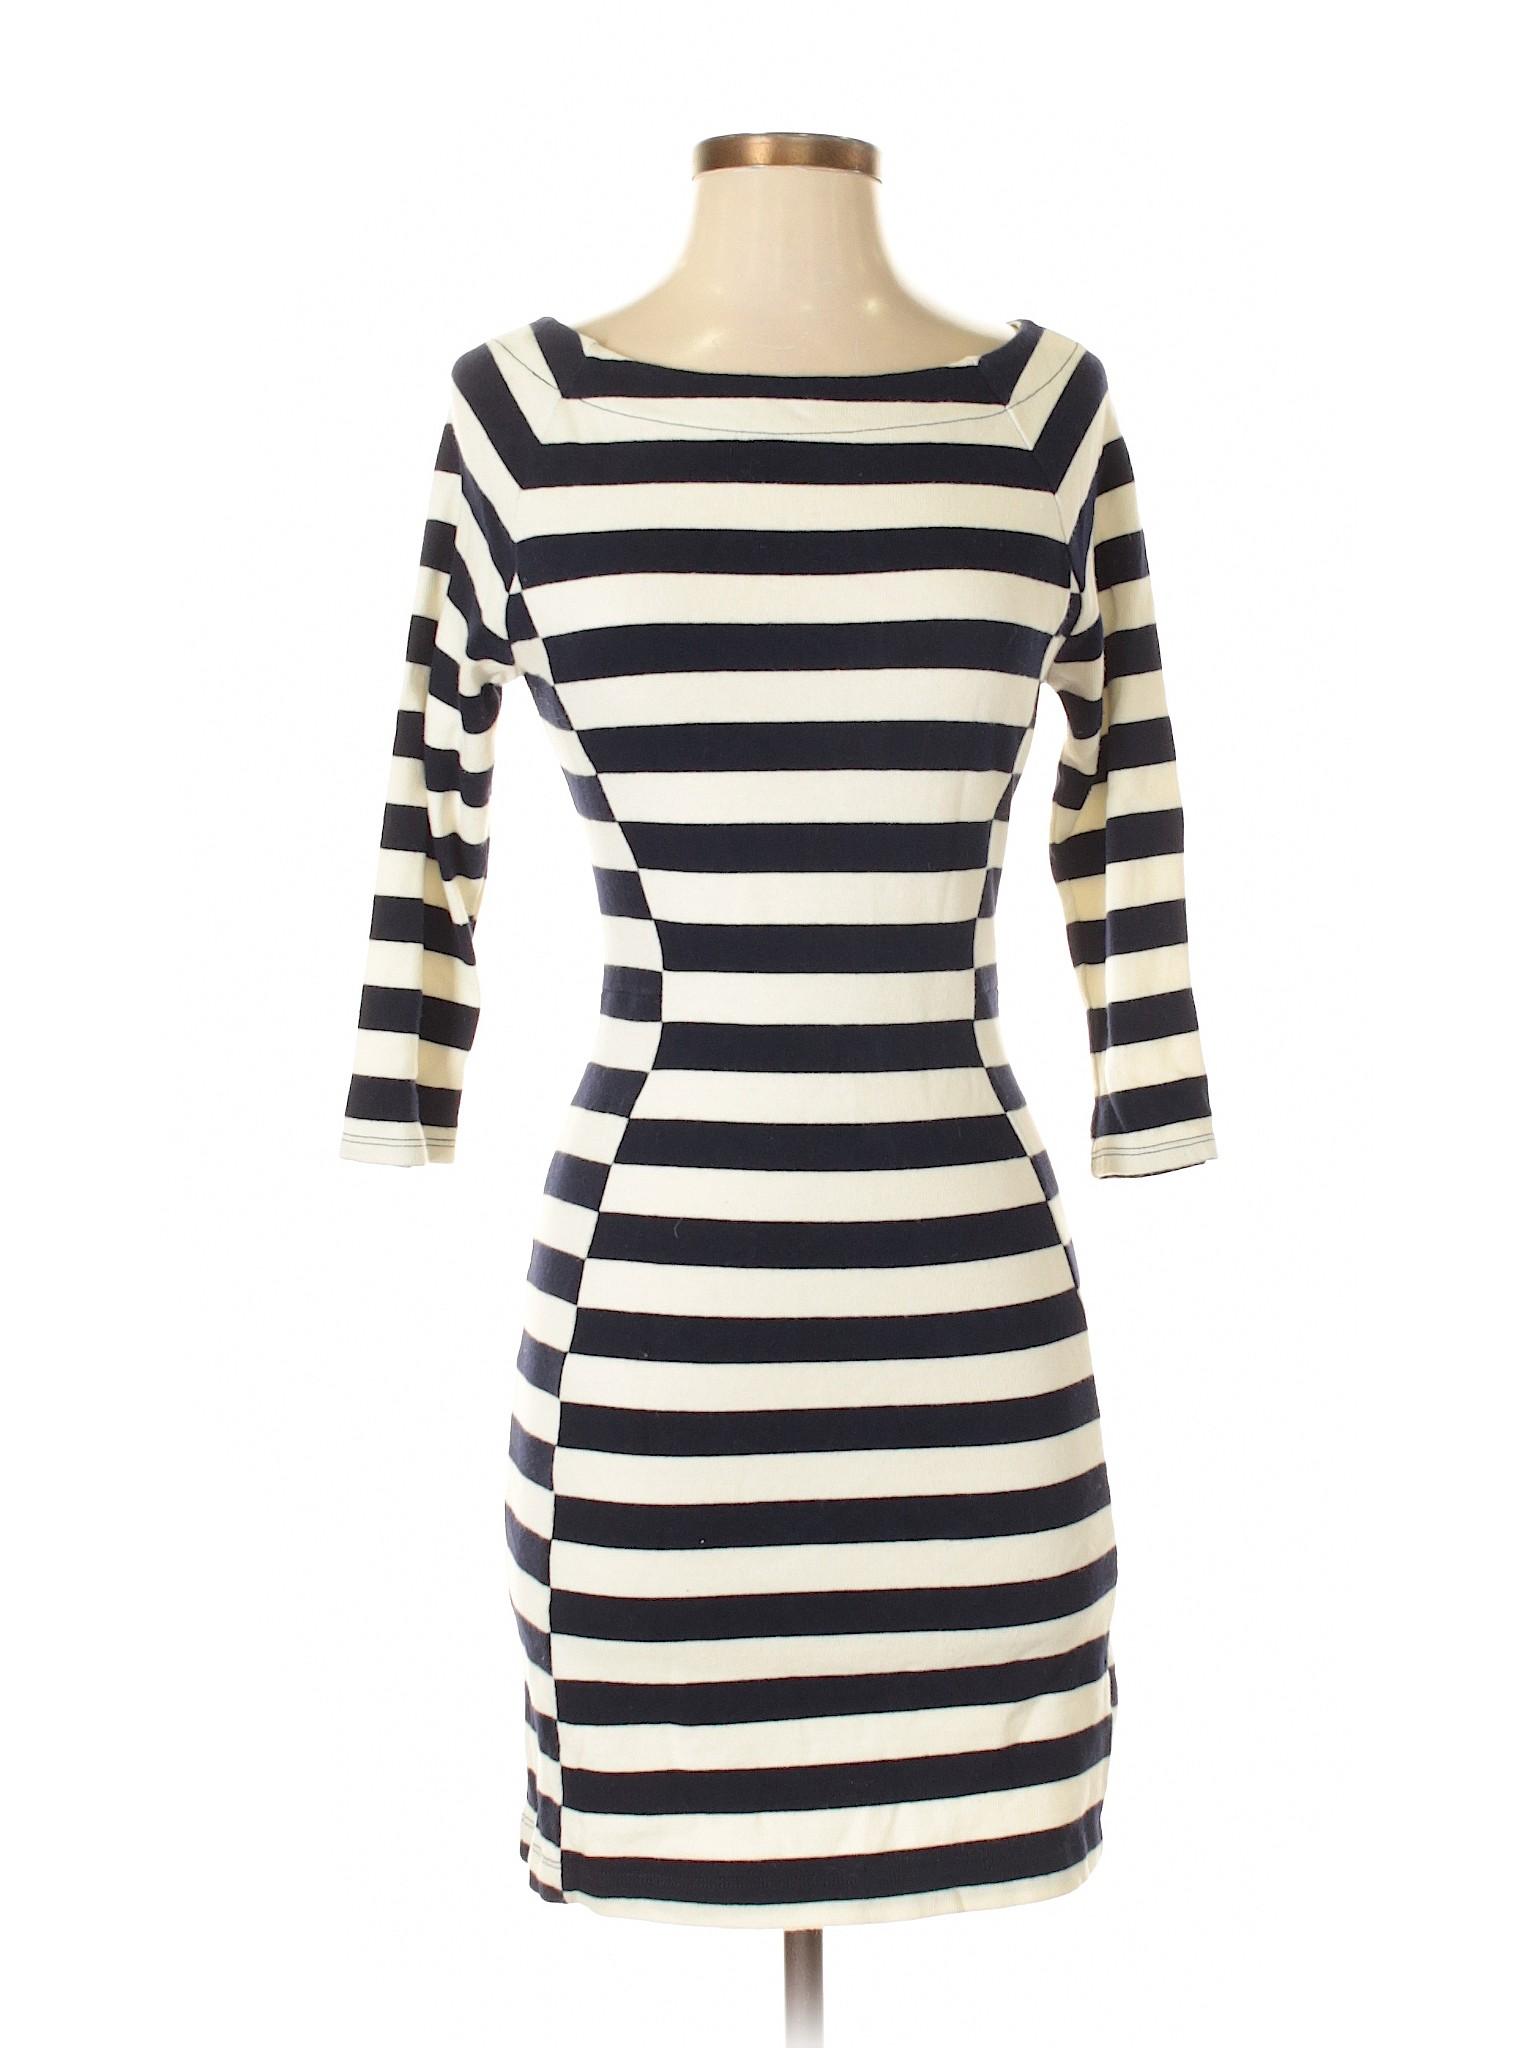 Gap Selling Casual Selling Gap Dress TvqwZa1